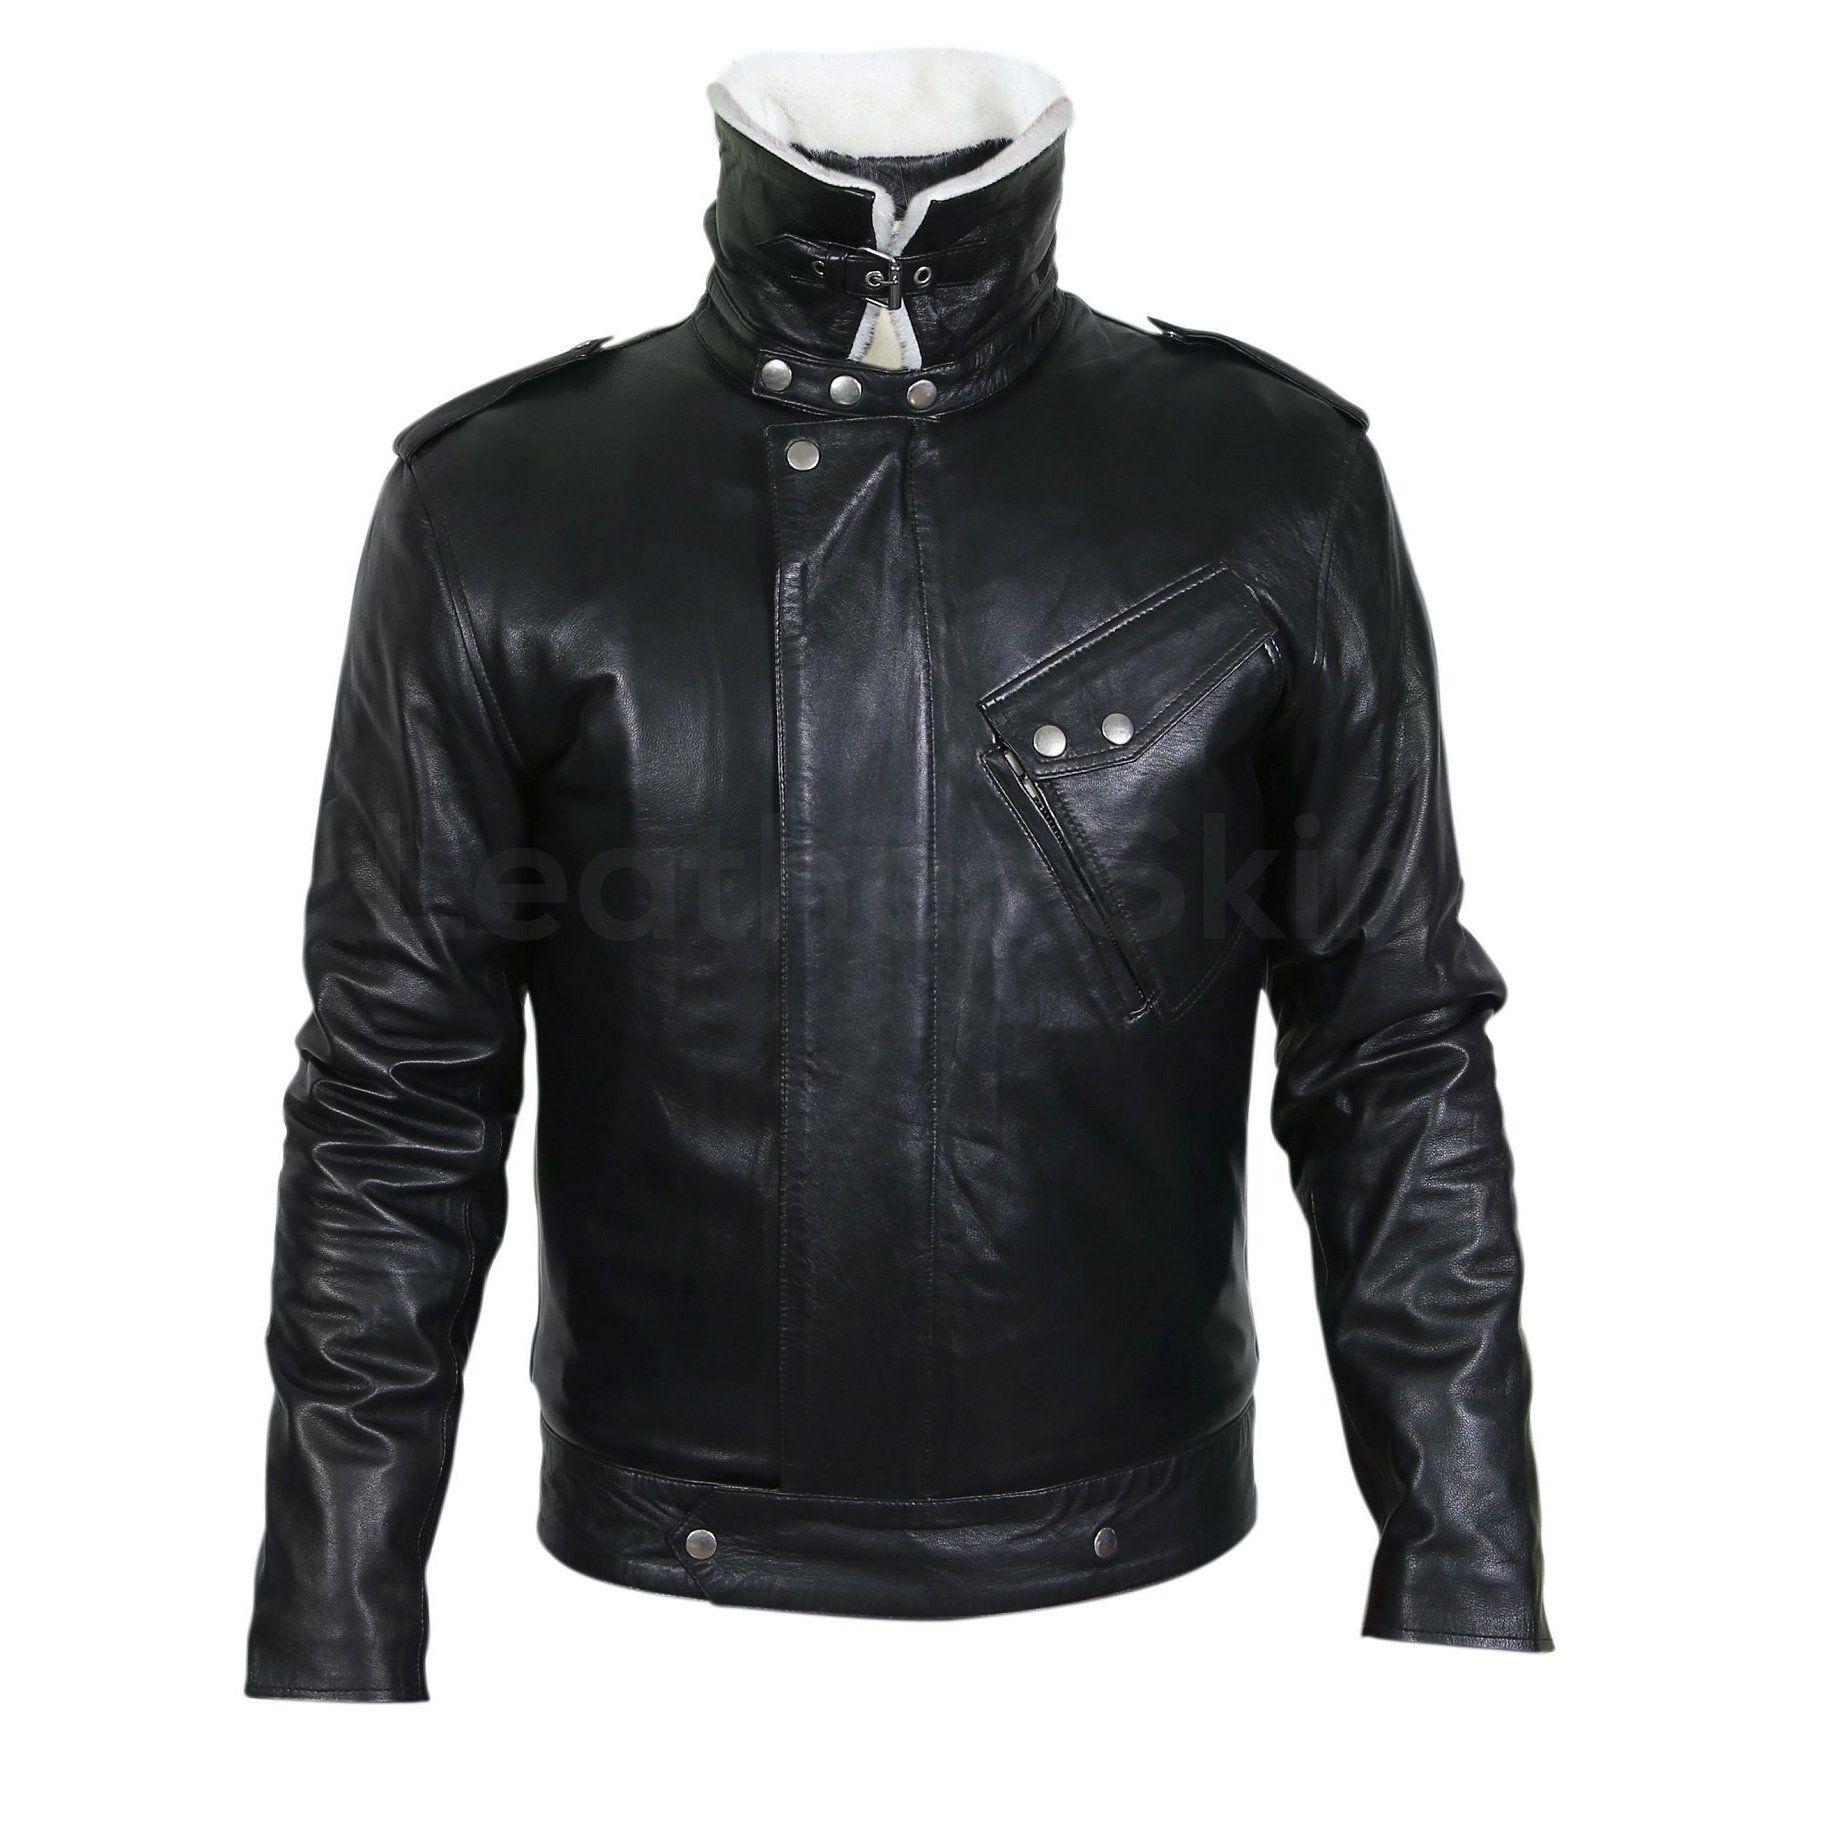 Men Black Genuine Leather Jacket with White Fur Collar